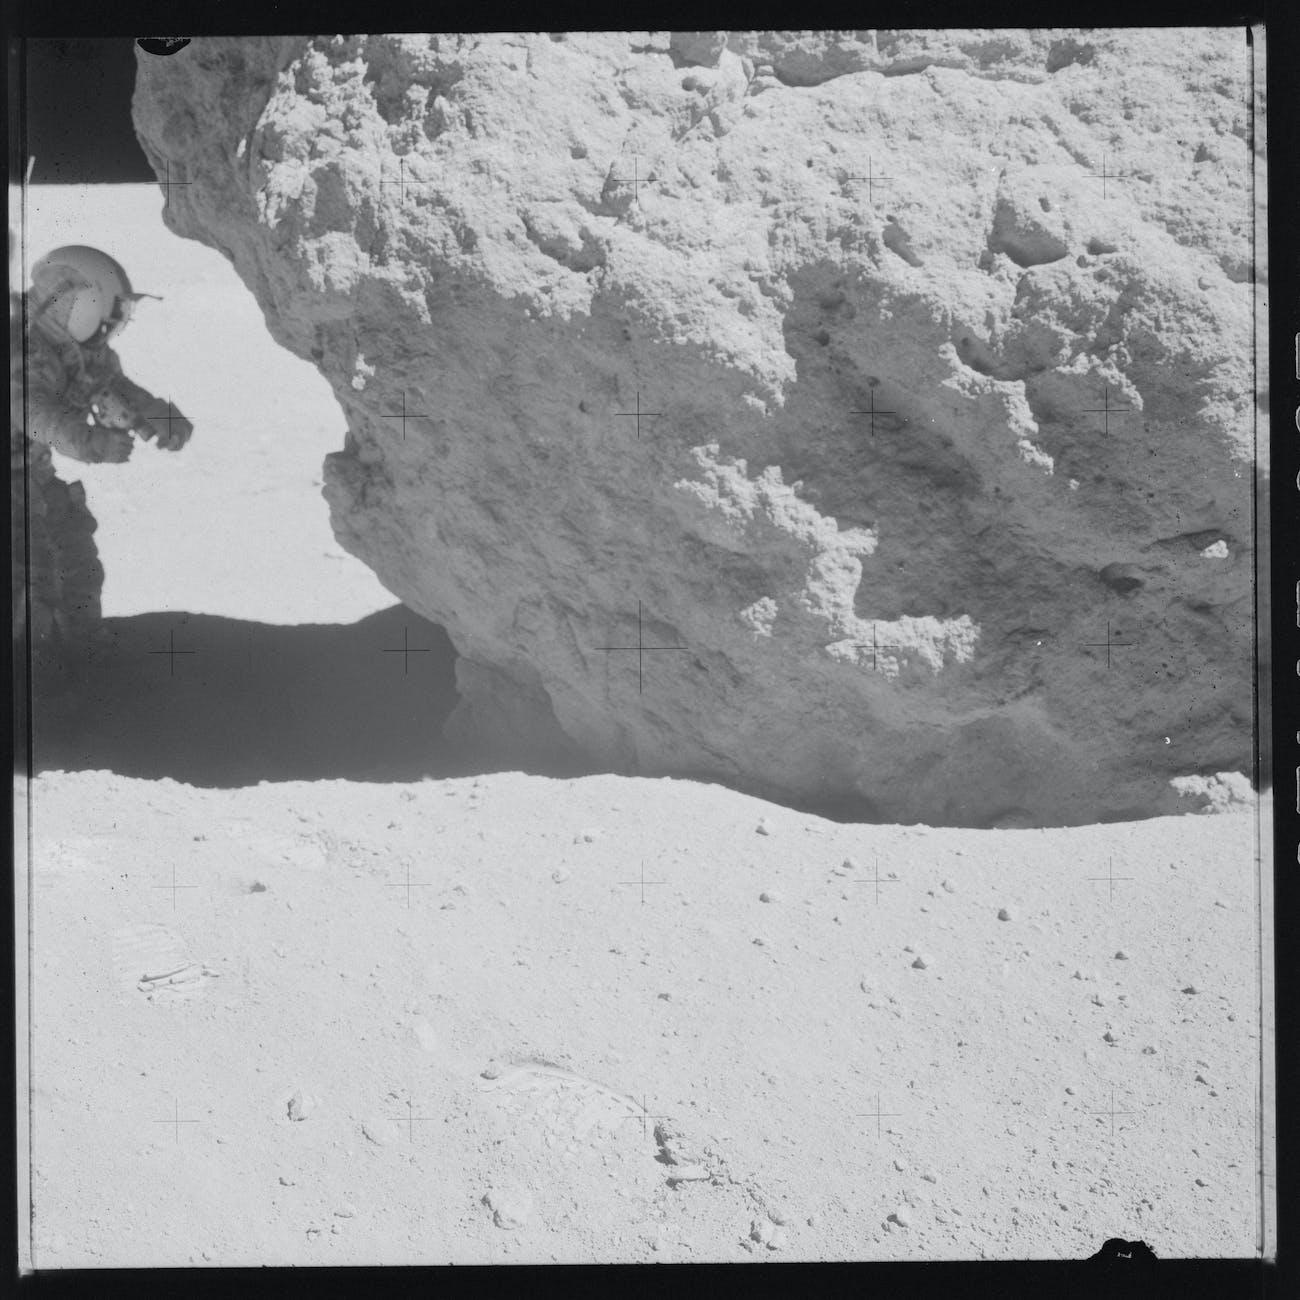 Apollo 16 Rocks